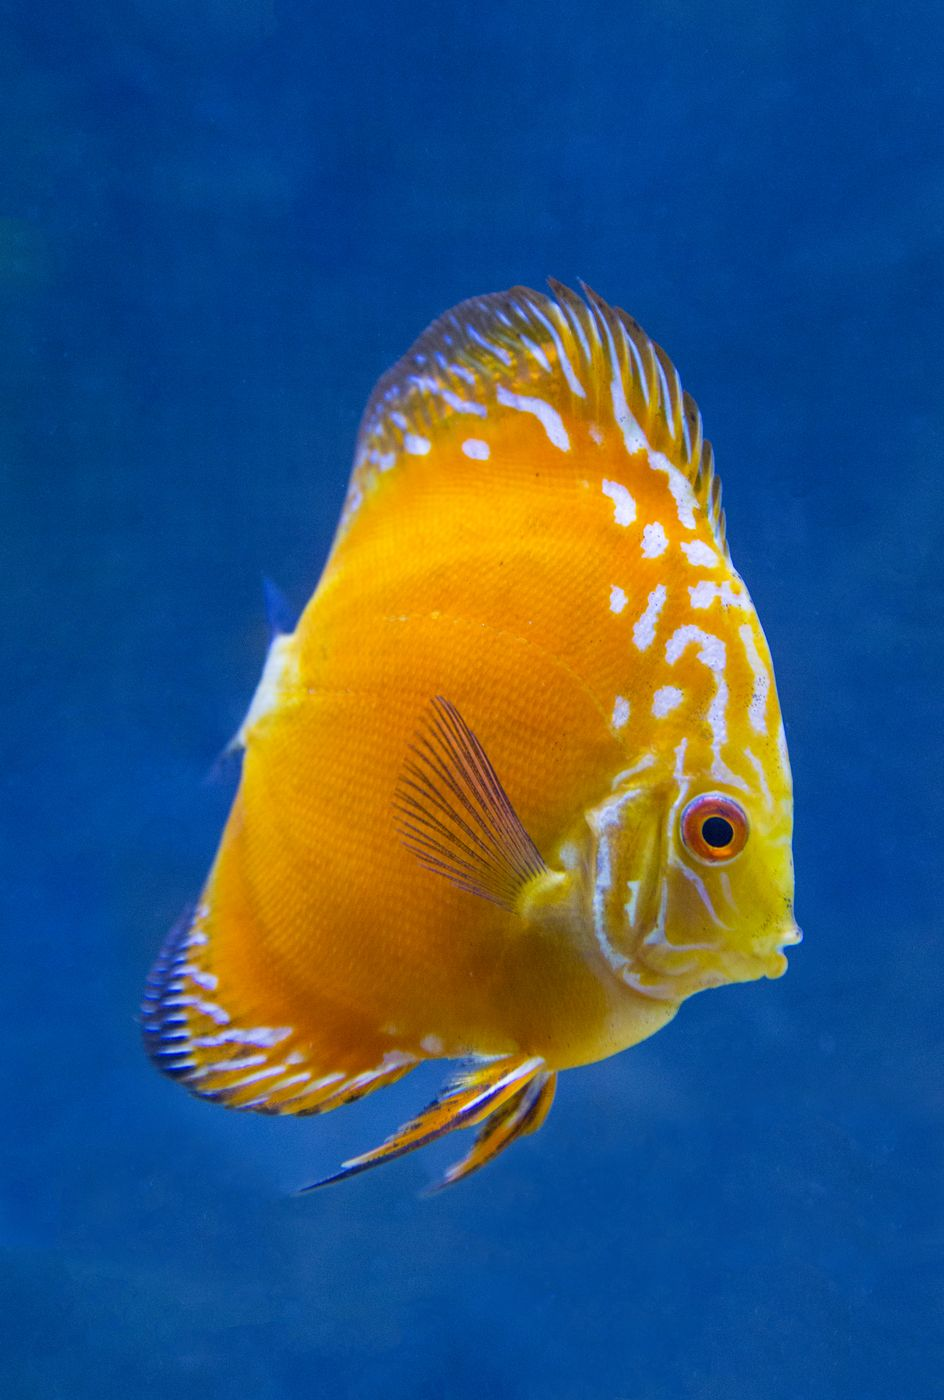 Blue And Gold Golden Checkerboard Pigeon Discus Discus Fish Discus Aquarium Fresh Water Fish Tank